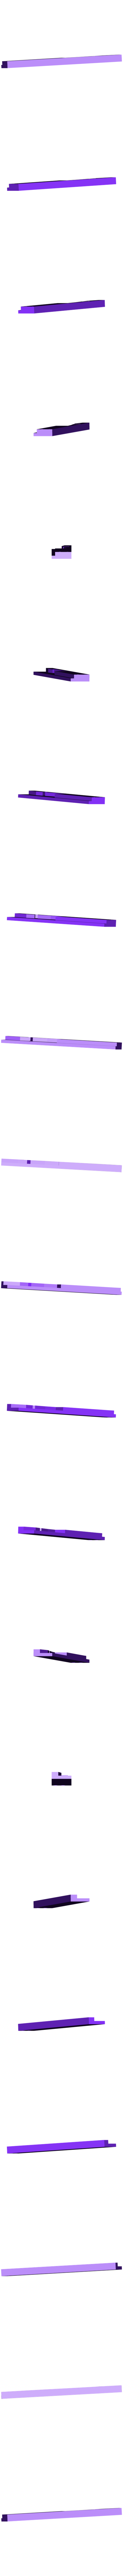 drawer slide right.stl Download free STL file Hogwarts School of Witchcraft • 3D printer template, Valient